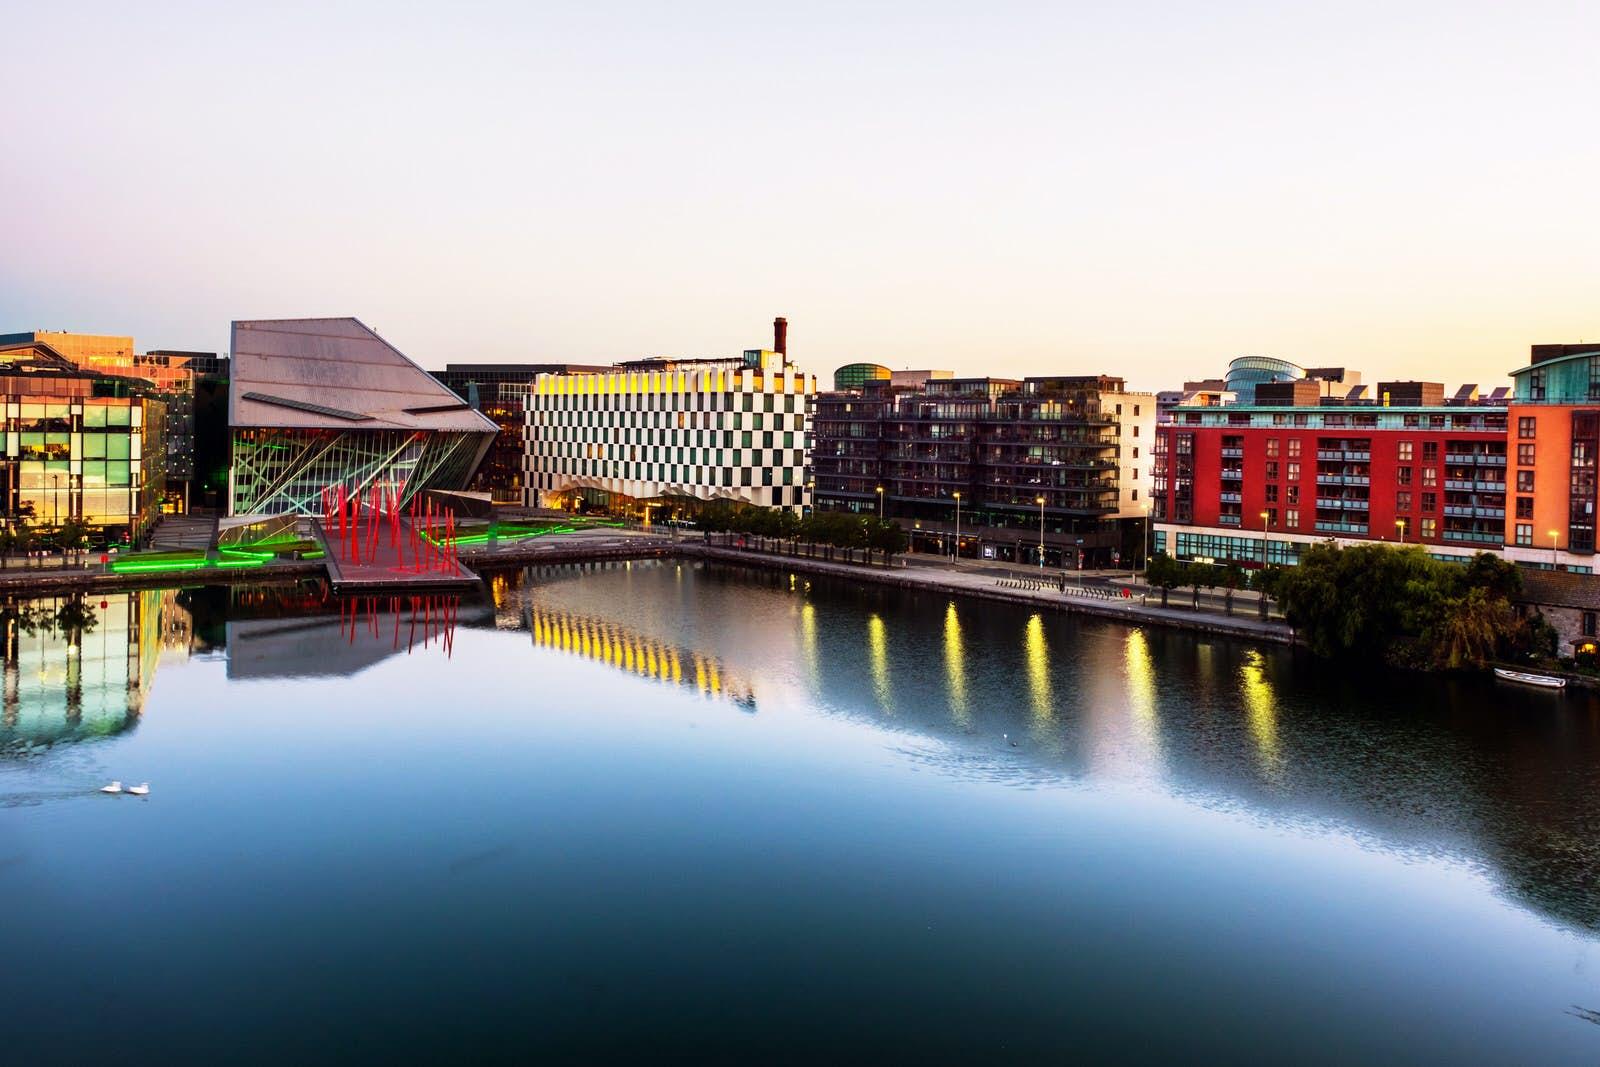 100 gratis dating sites Dublin